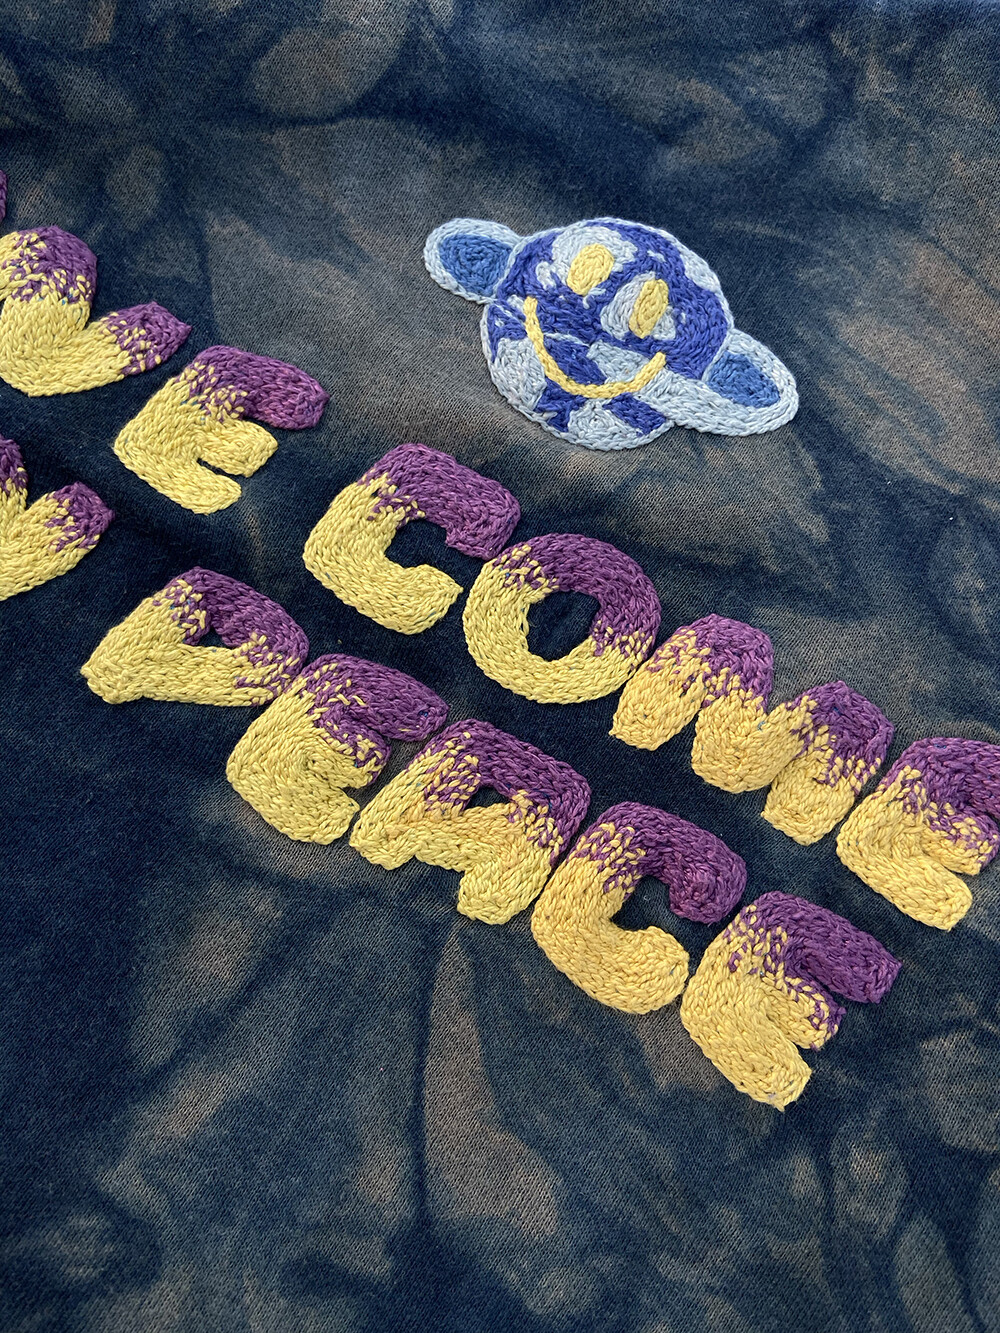 W'MENSWEAR 'We Come in Peace' Hand Embroidered, Indigo Sweatshirt